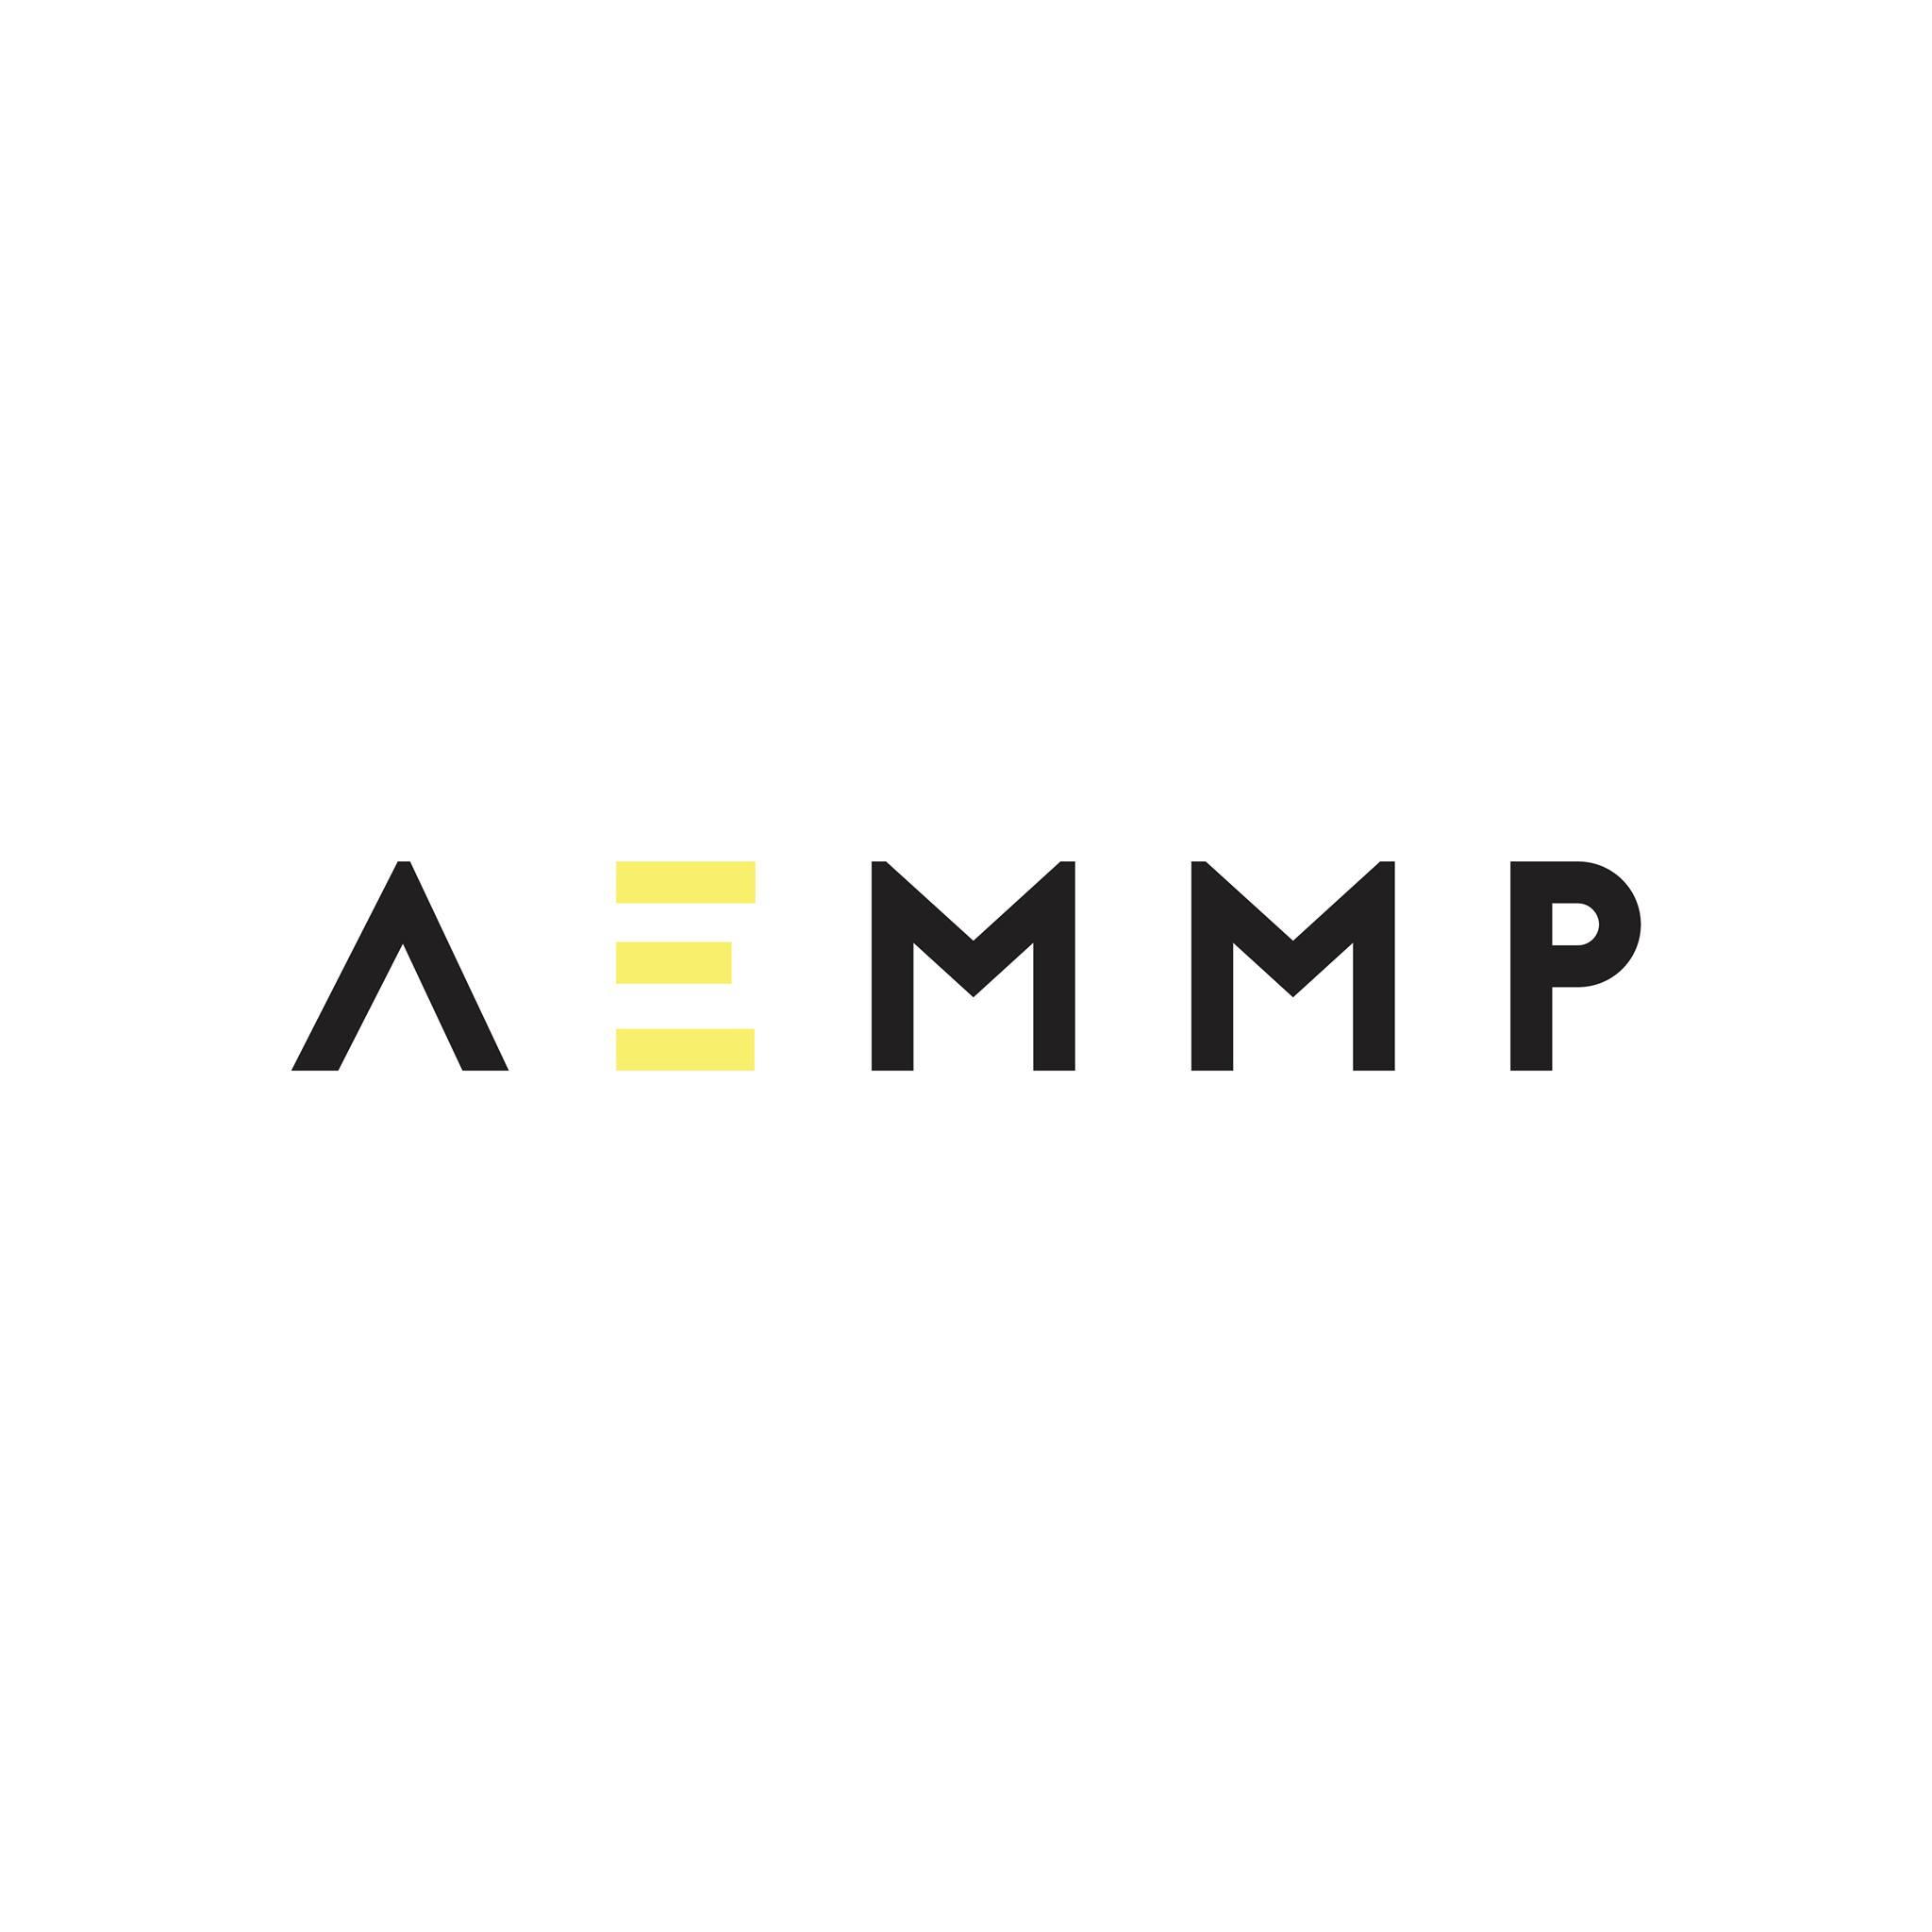 Course Spotlight: AEMMP Hip-Hop